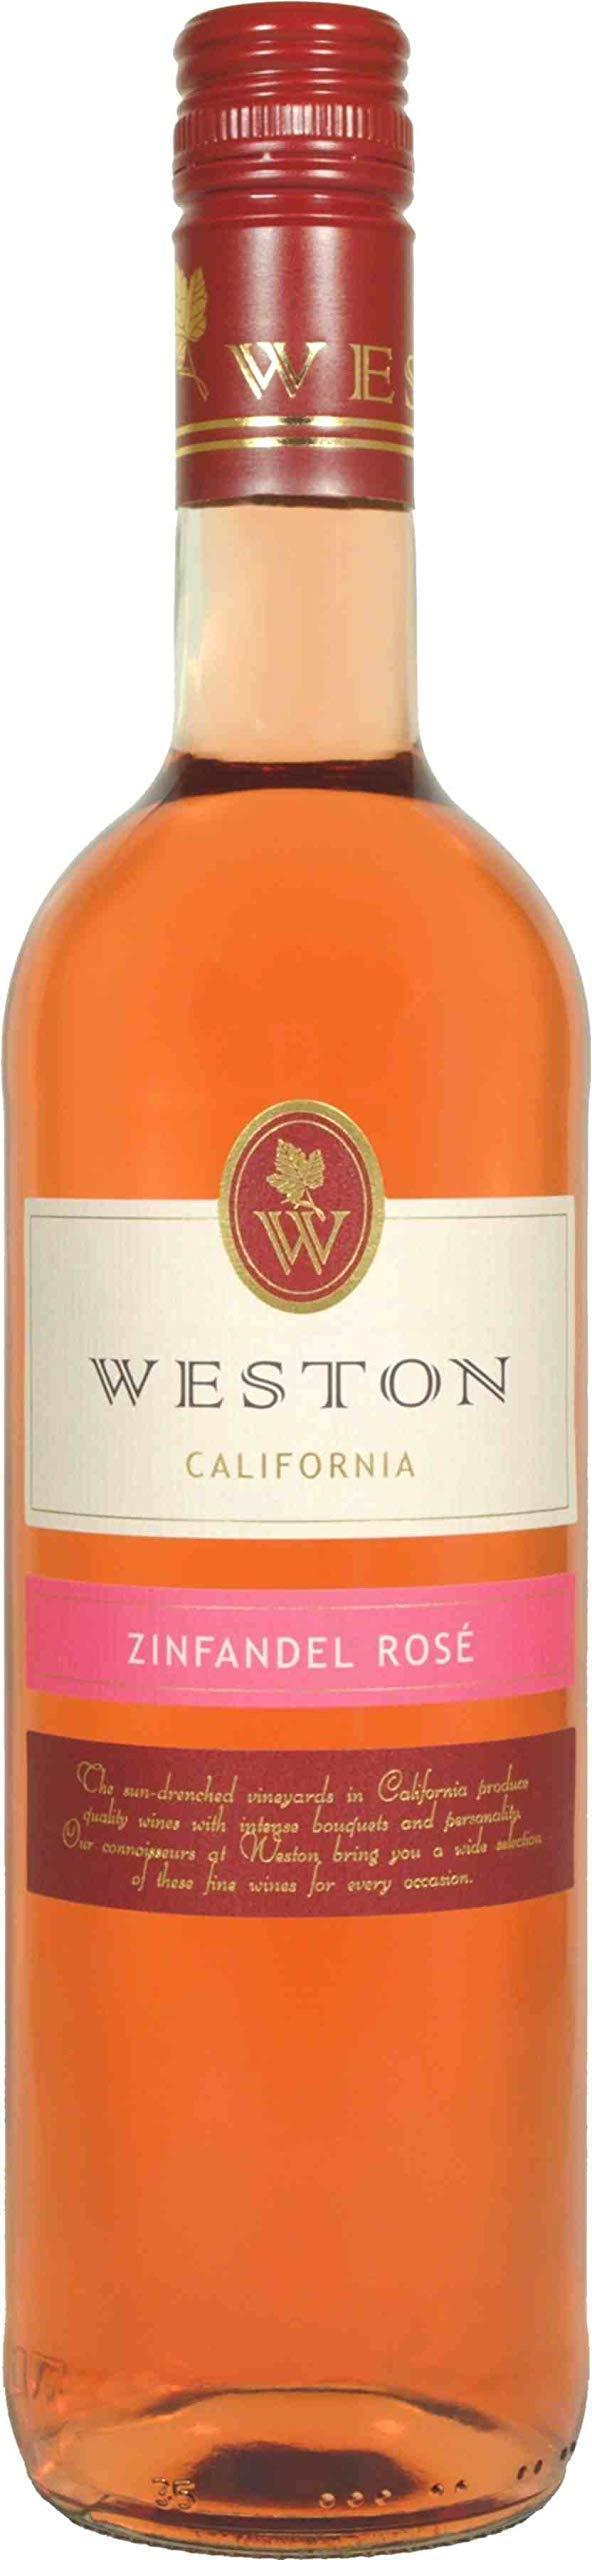 Golden-State-Vintners-Weston-Zinfandel-Rose-20152017-Lieblich-6-x-075-l